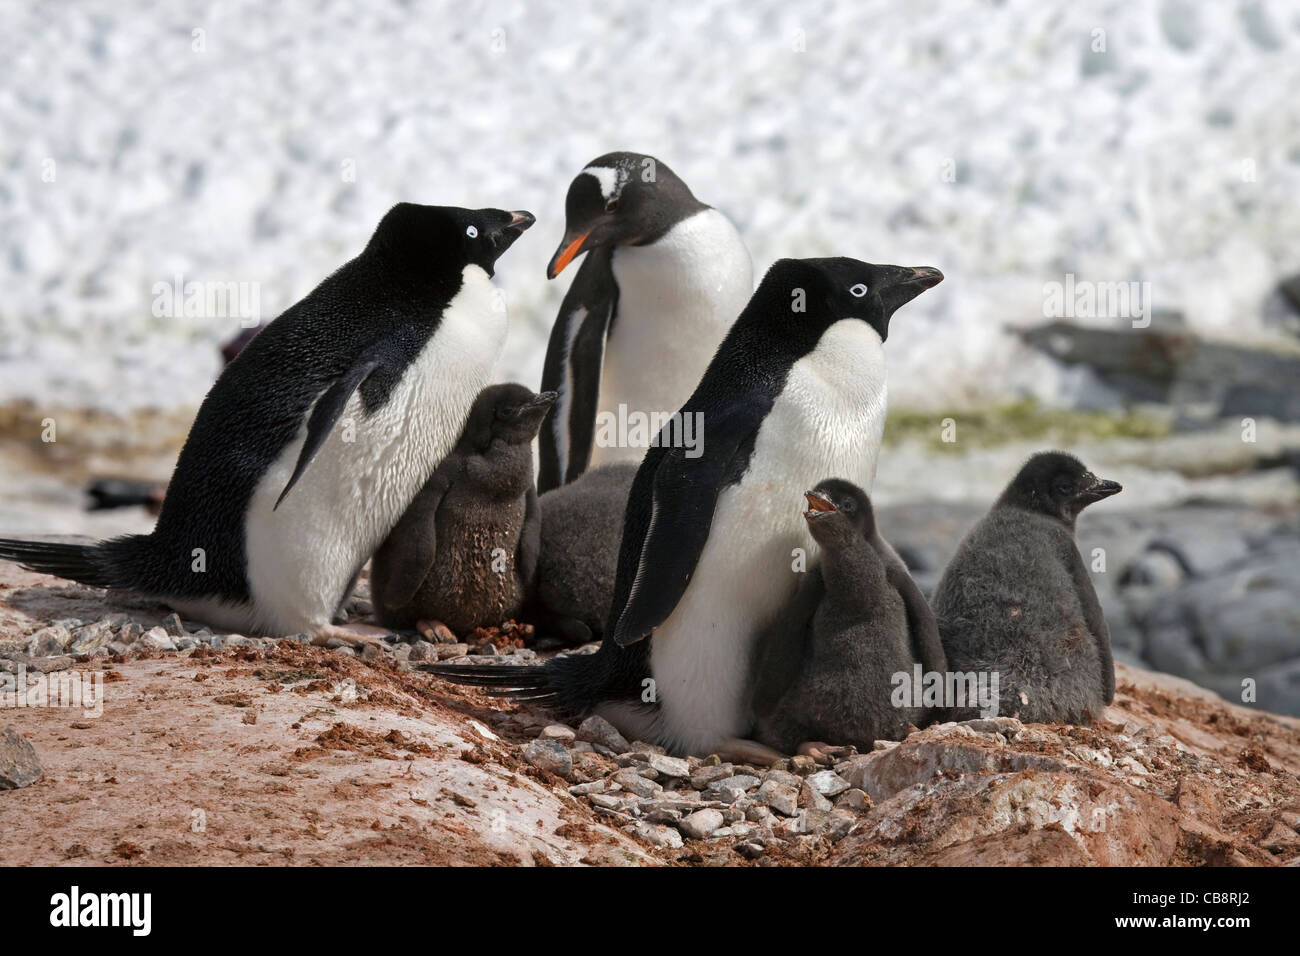 Gentoo Penguin (Pygoscelis papua) intruding Adélie Penguins (Pygoscelis adeliae) colony with chicks on nest, - Stock Image